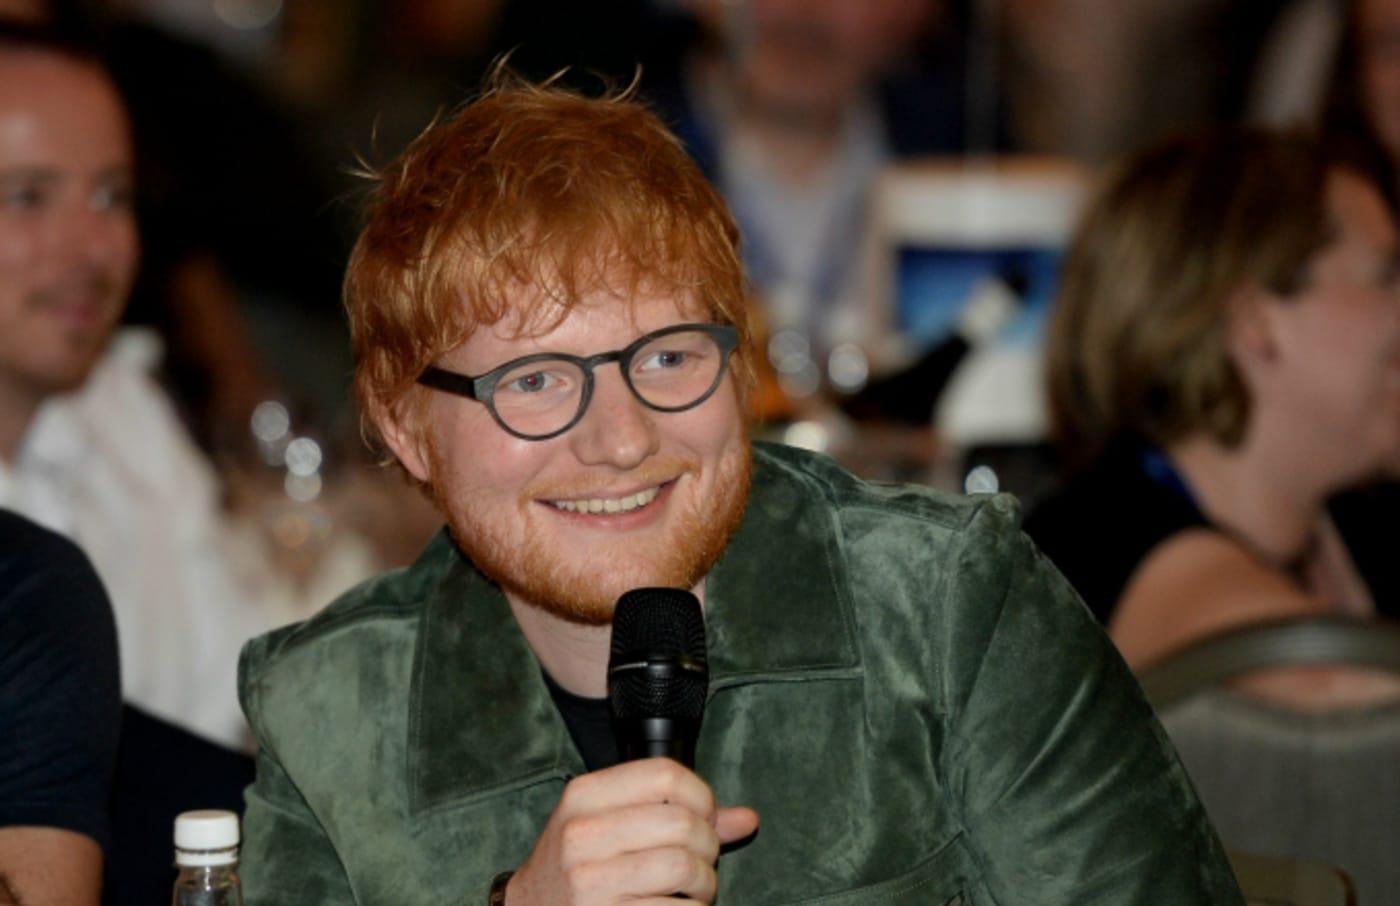 Ed Sheeran during the Nordoff Robbins O2 Silver Clef Awards 2019